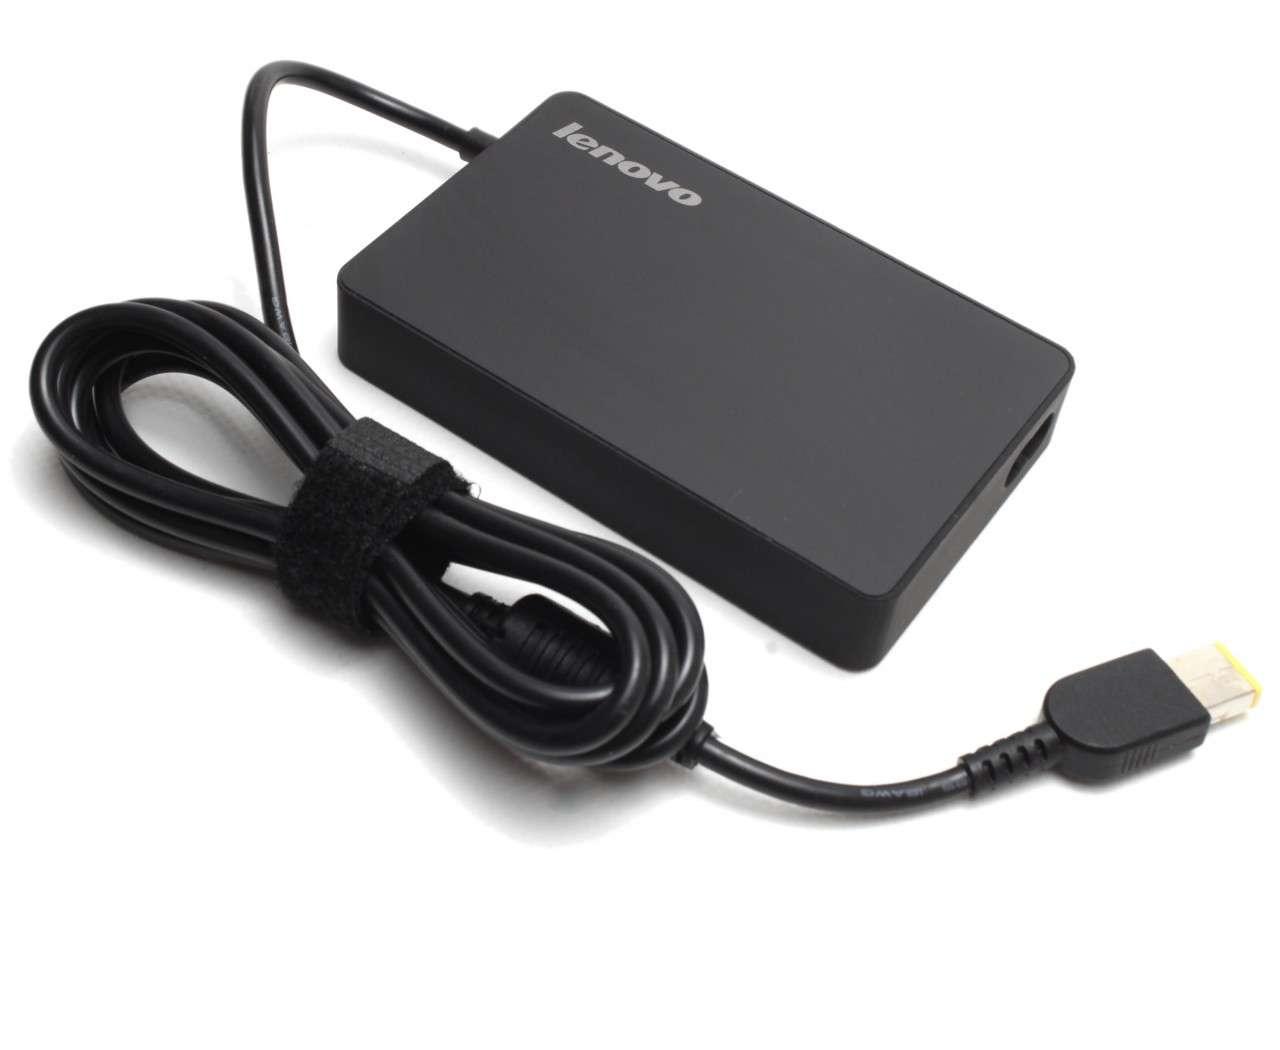 Incarcator Lenovo ThinkPad S540 208300590E 65W Slim Version imagine